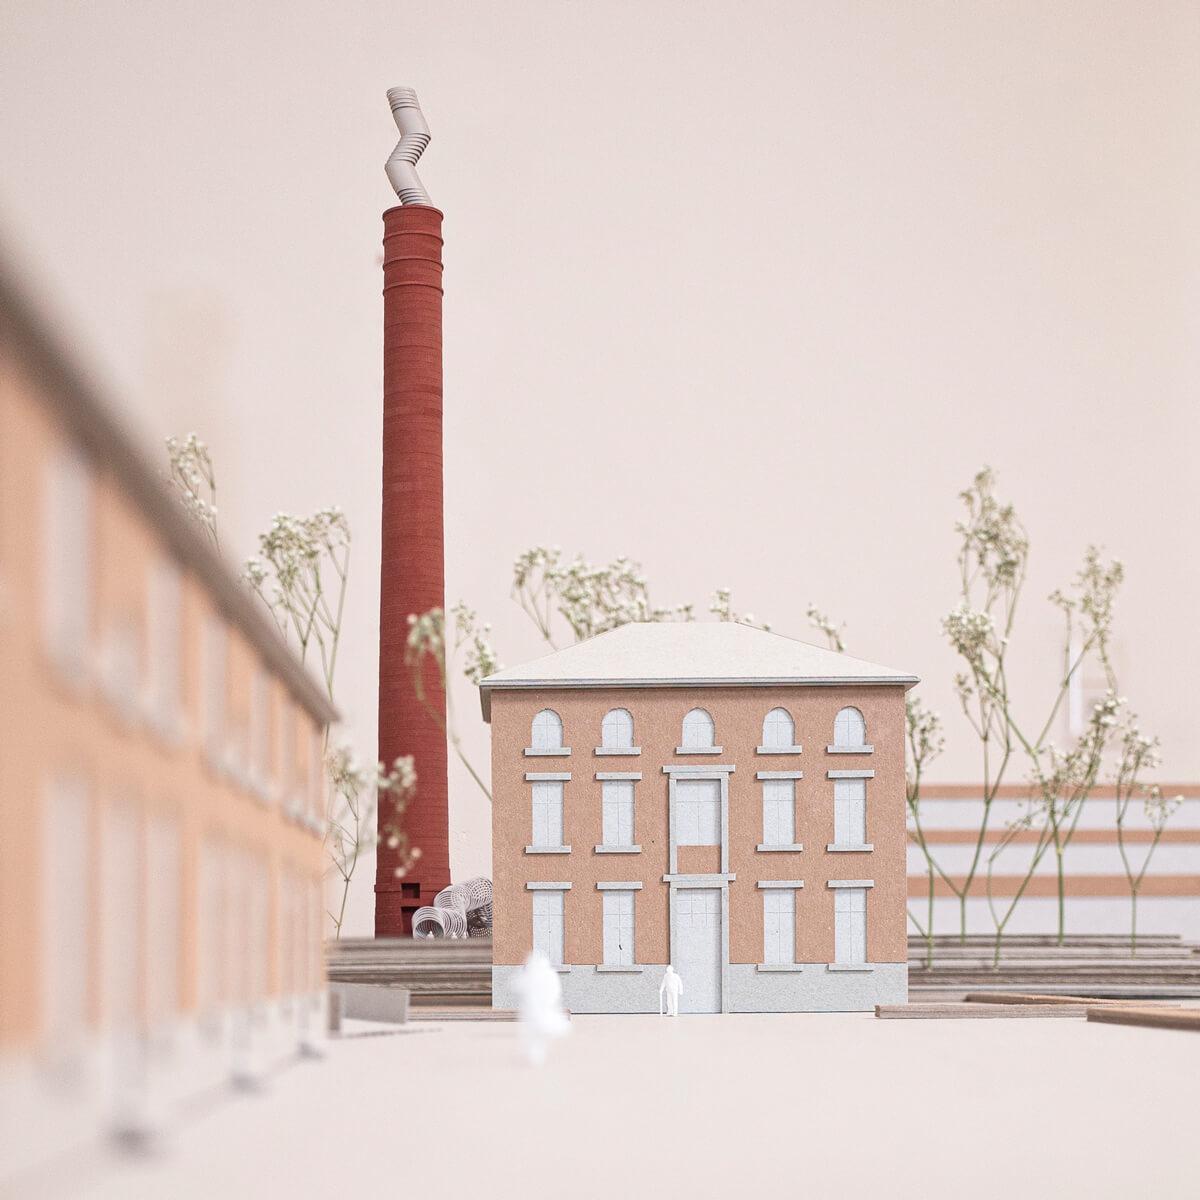 Zincoli-Kamin Modell Blick vom Zinkhütter Hof